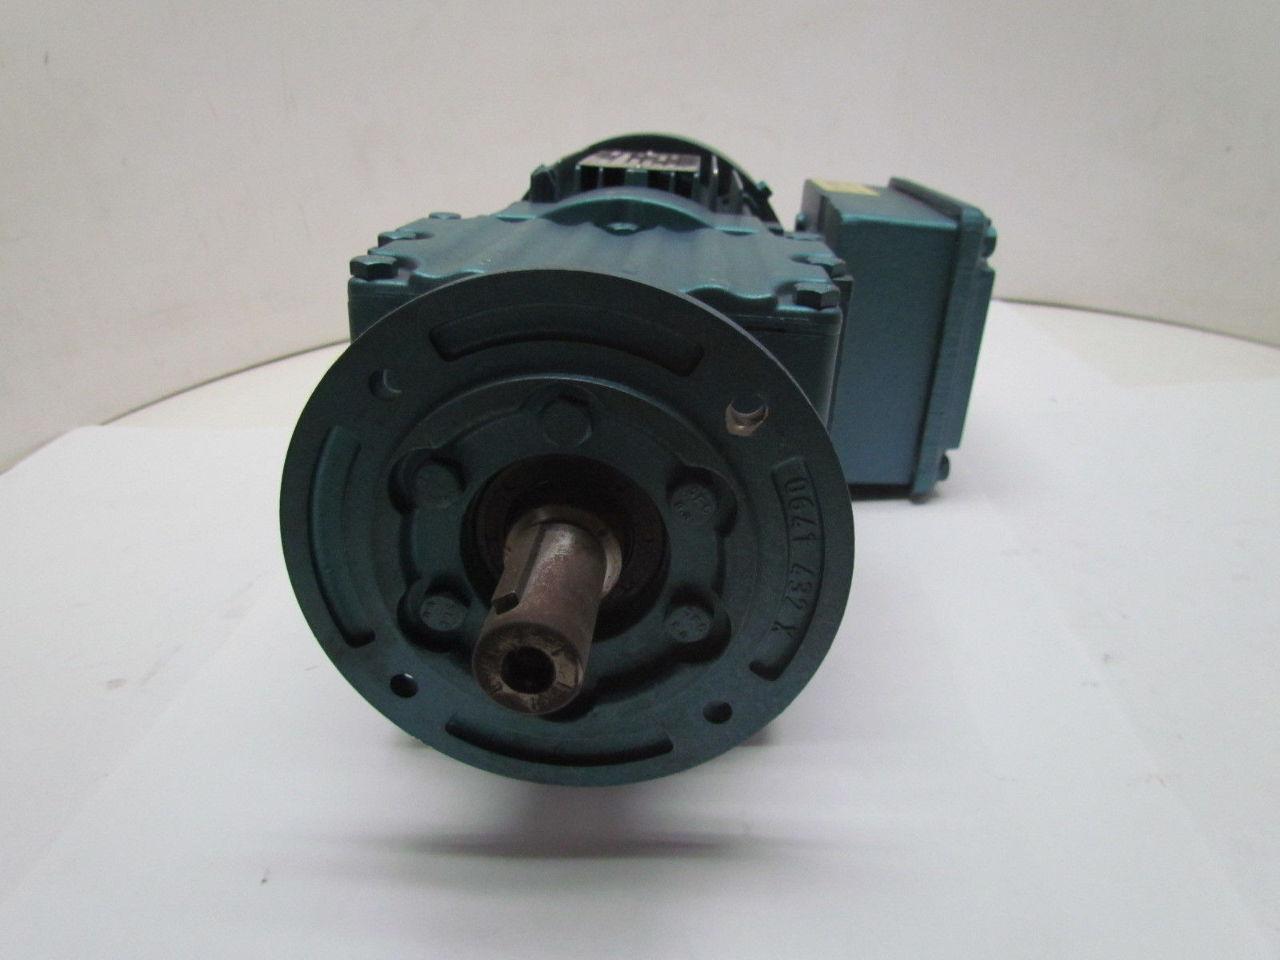 Sew Eurodrive Dft71c4 Motor Rf17dt71c4 Gear Reducer 133rpm